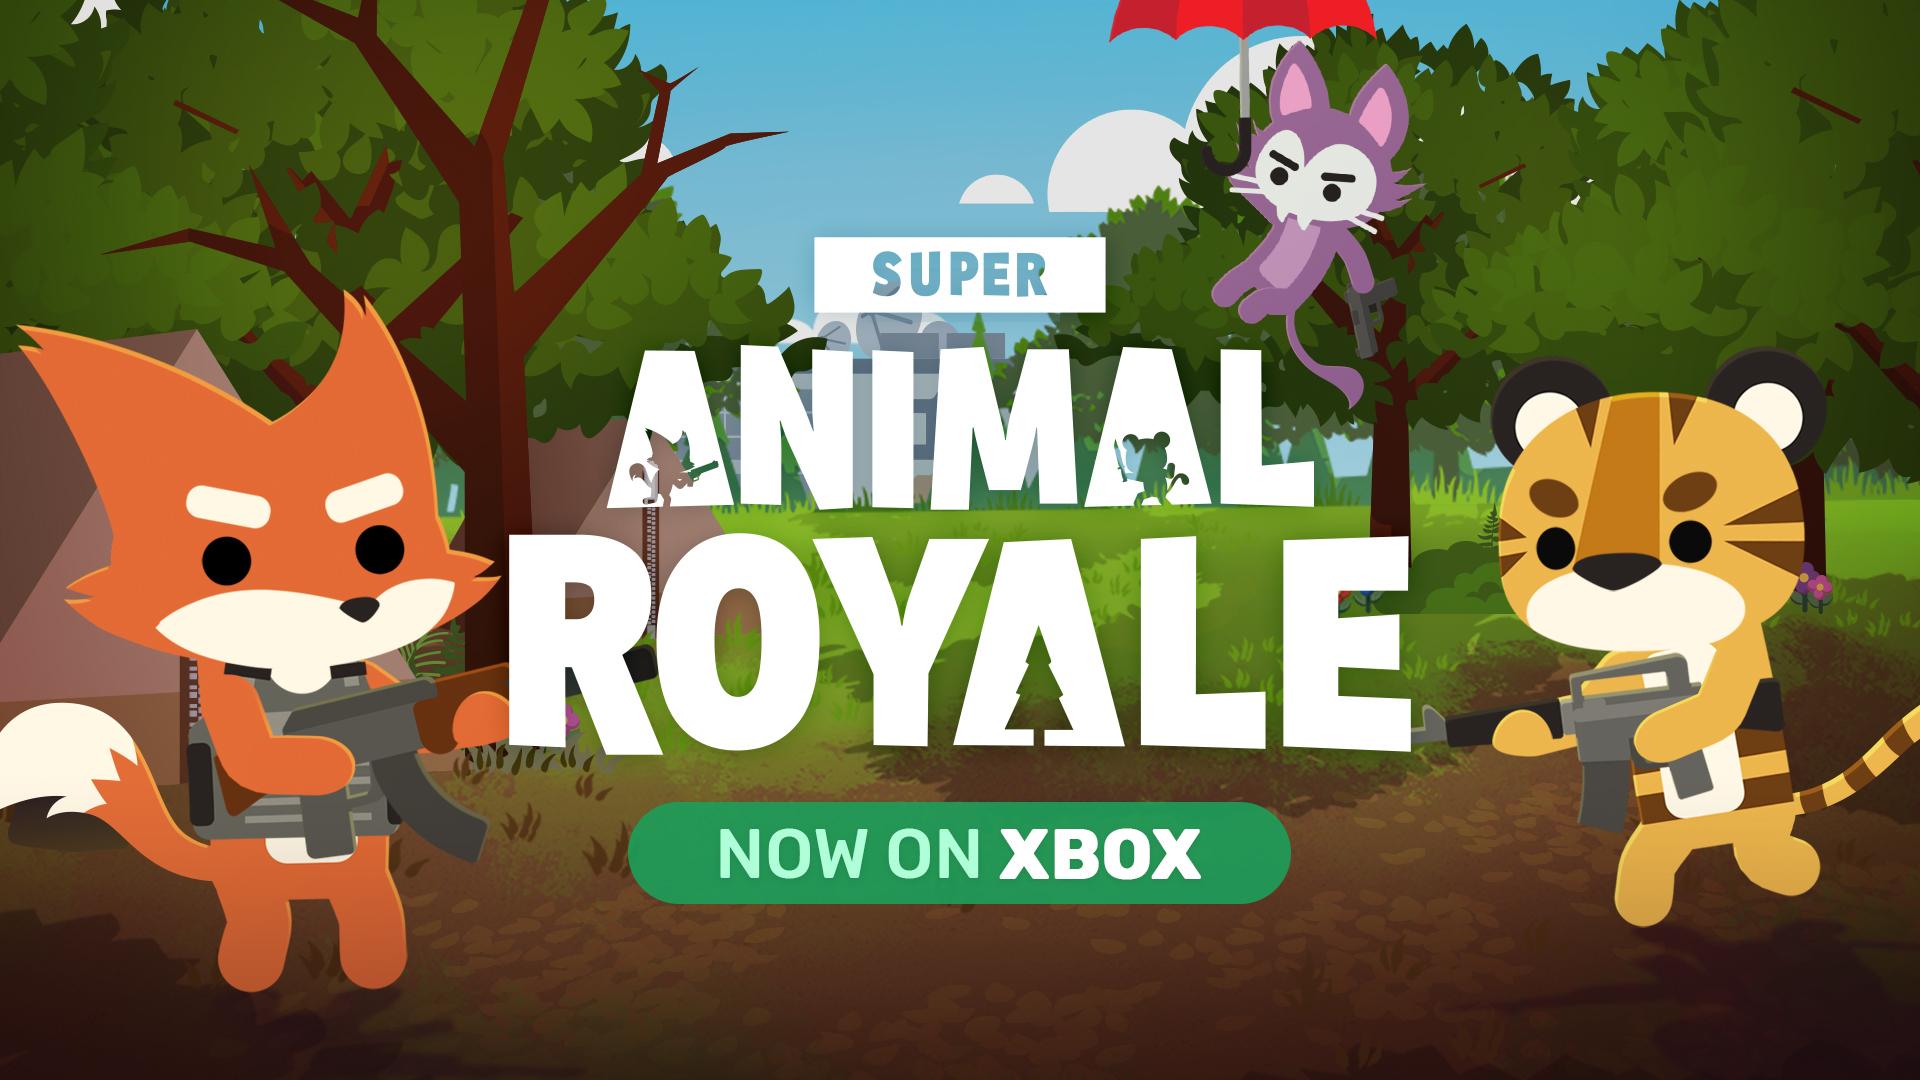 super animal royale desktop wallpaper 75189